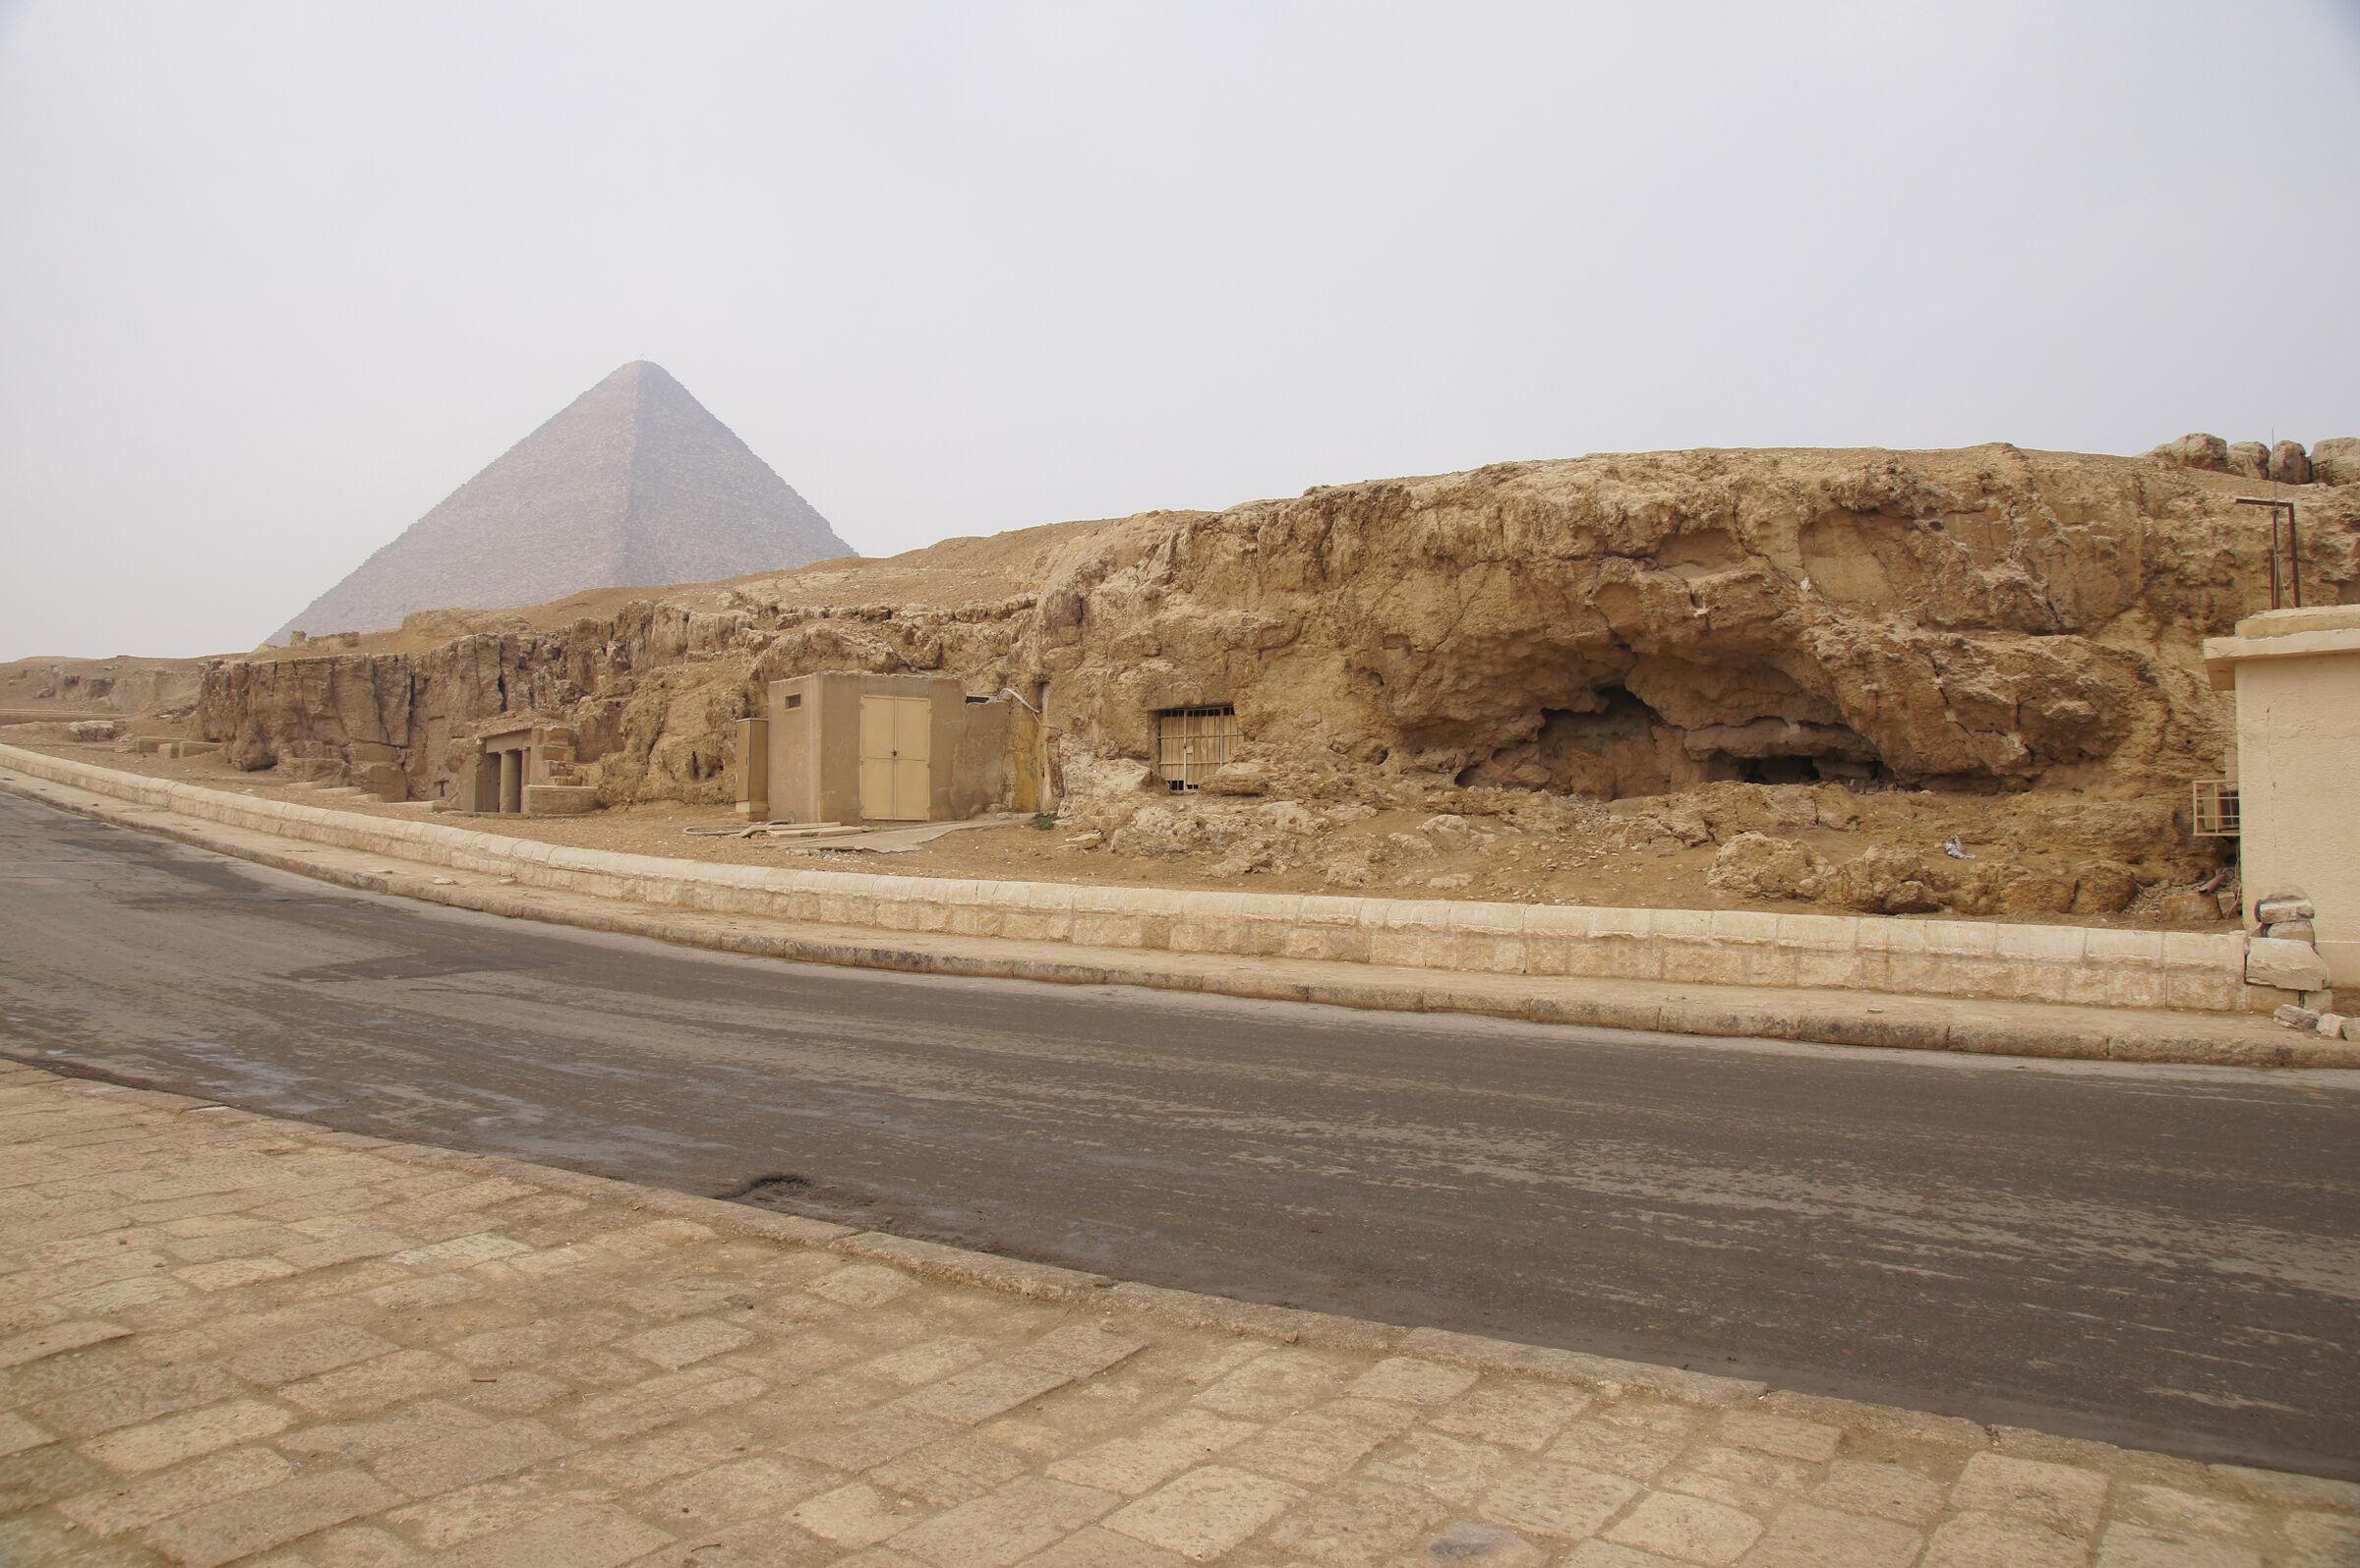 Sphinx Complex: Site: Giza; View: G 9090, G 9080, G 9060, G 9050